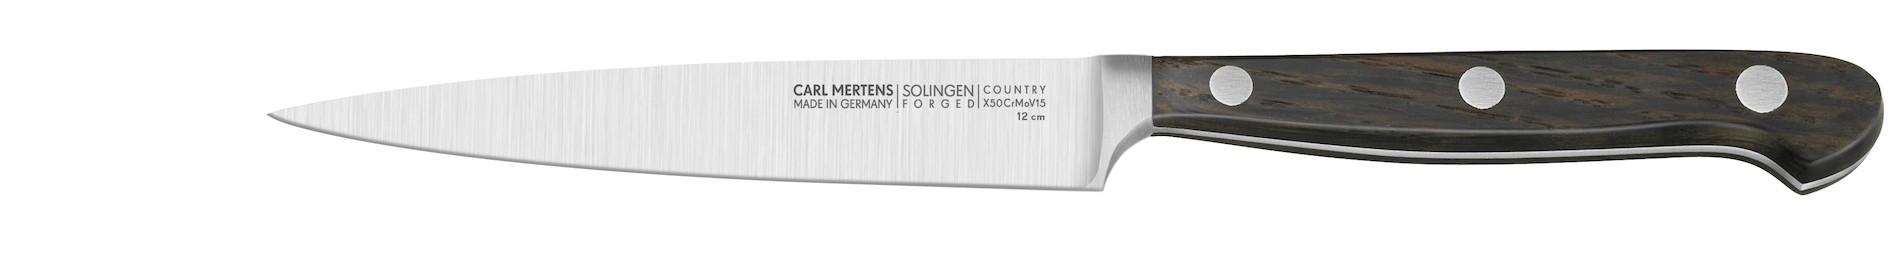 COUNTRY Spickmesser groß 12 cm